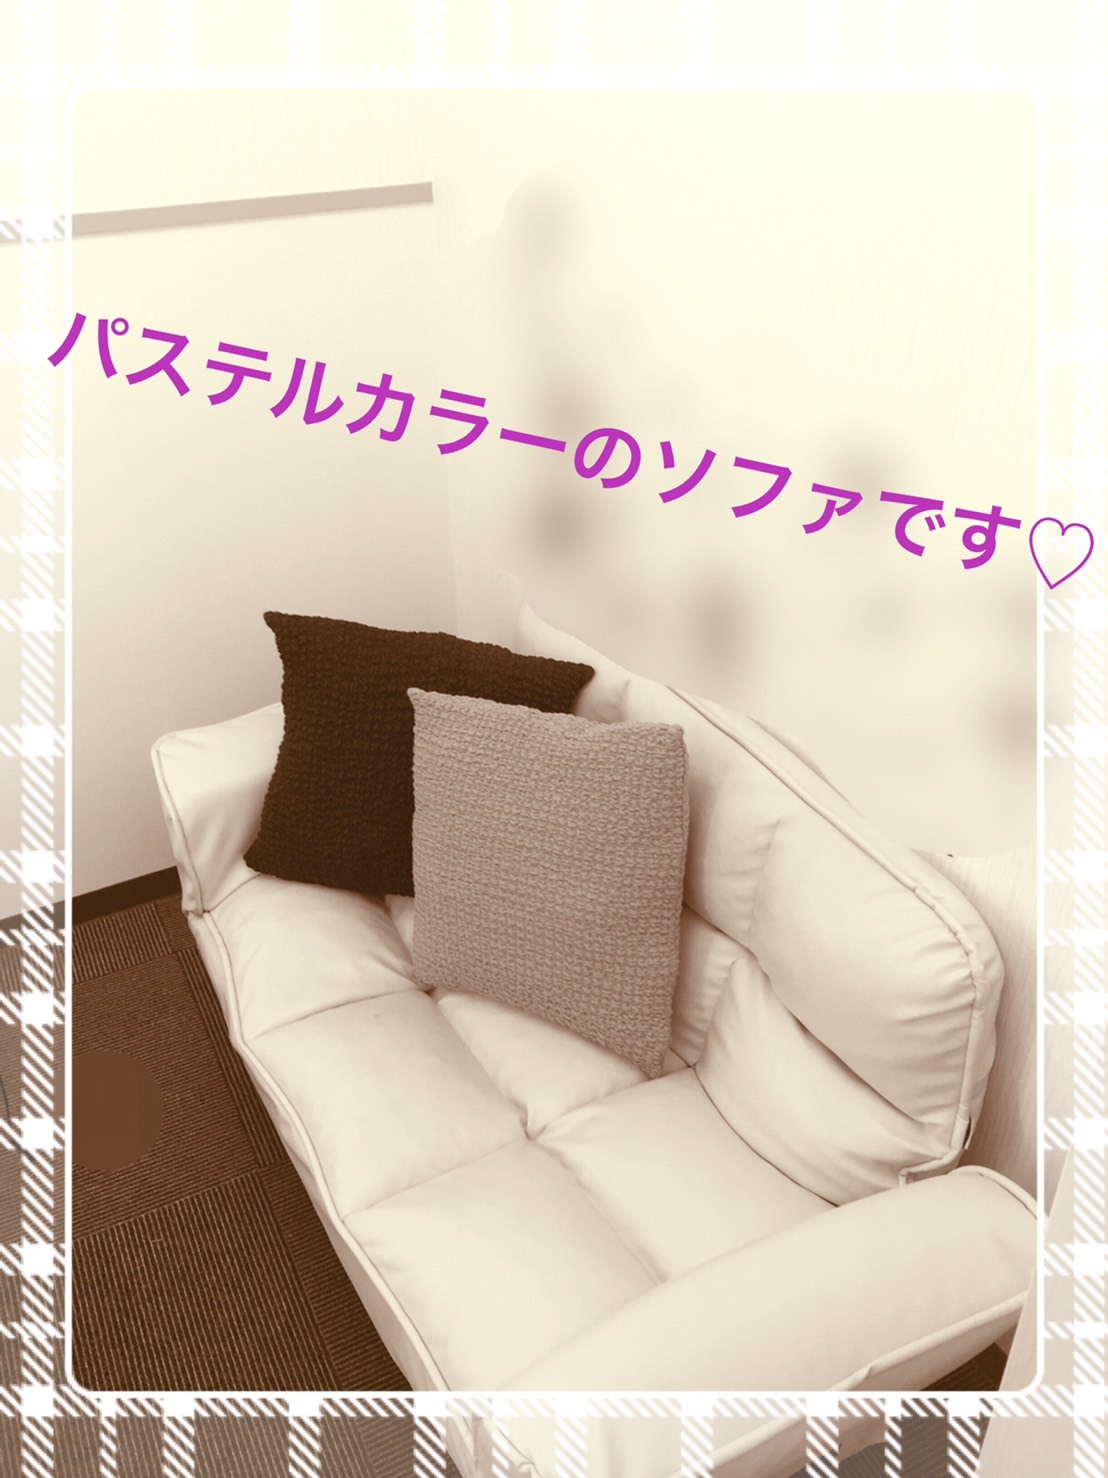 S__4481034.jpg